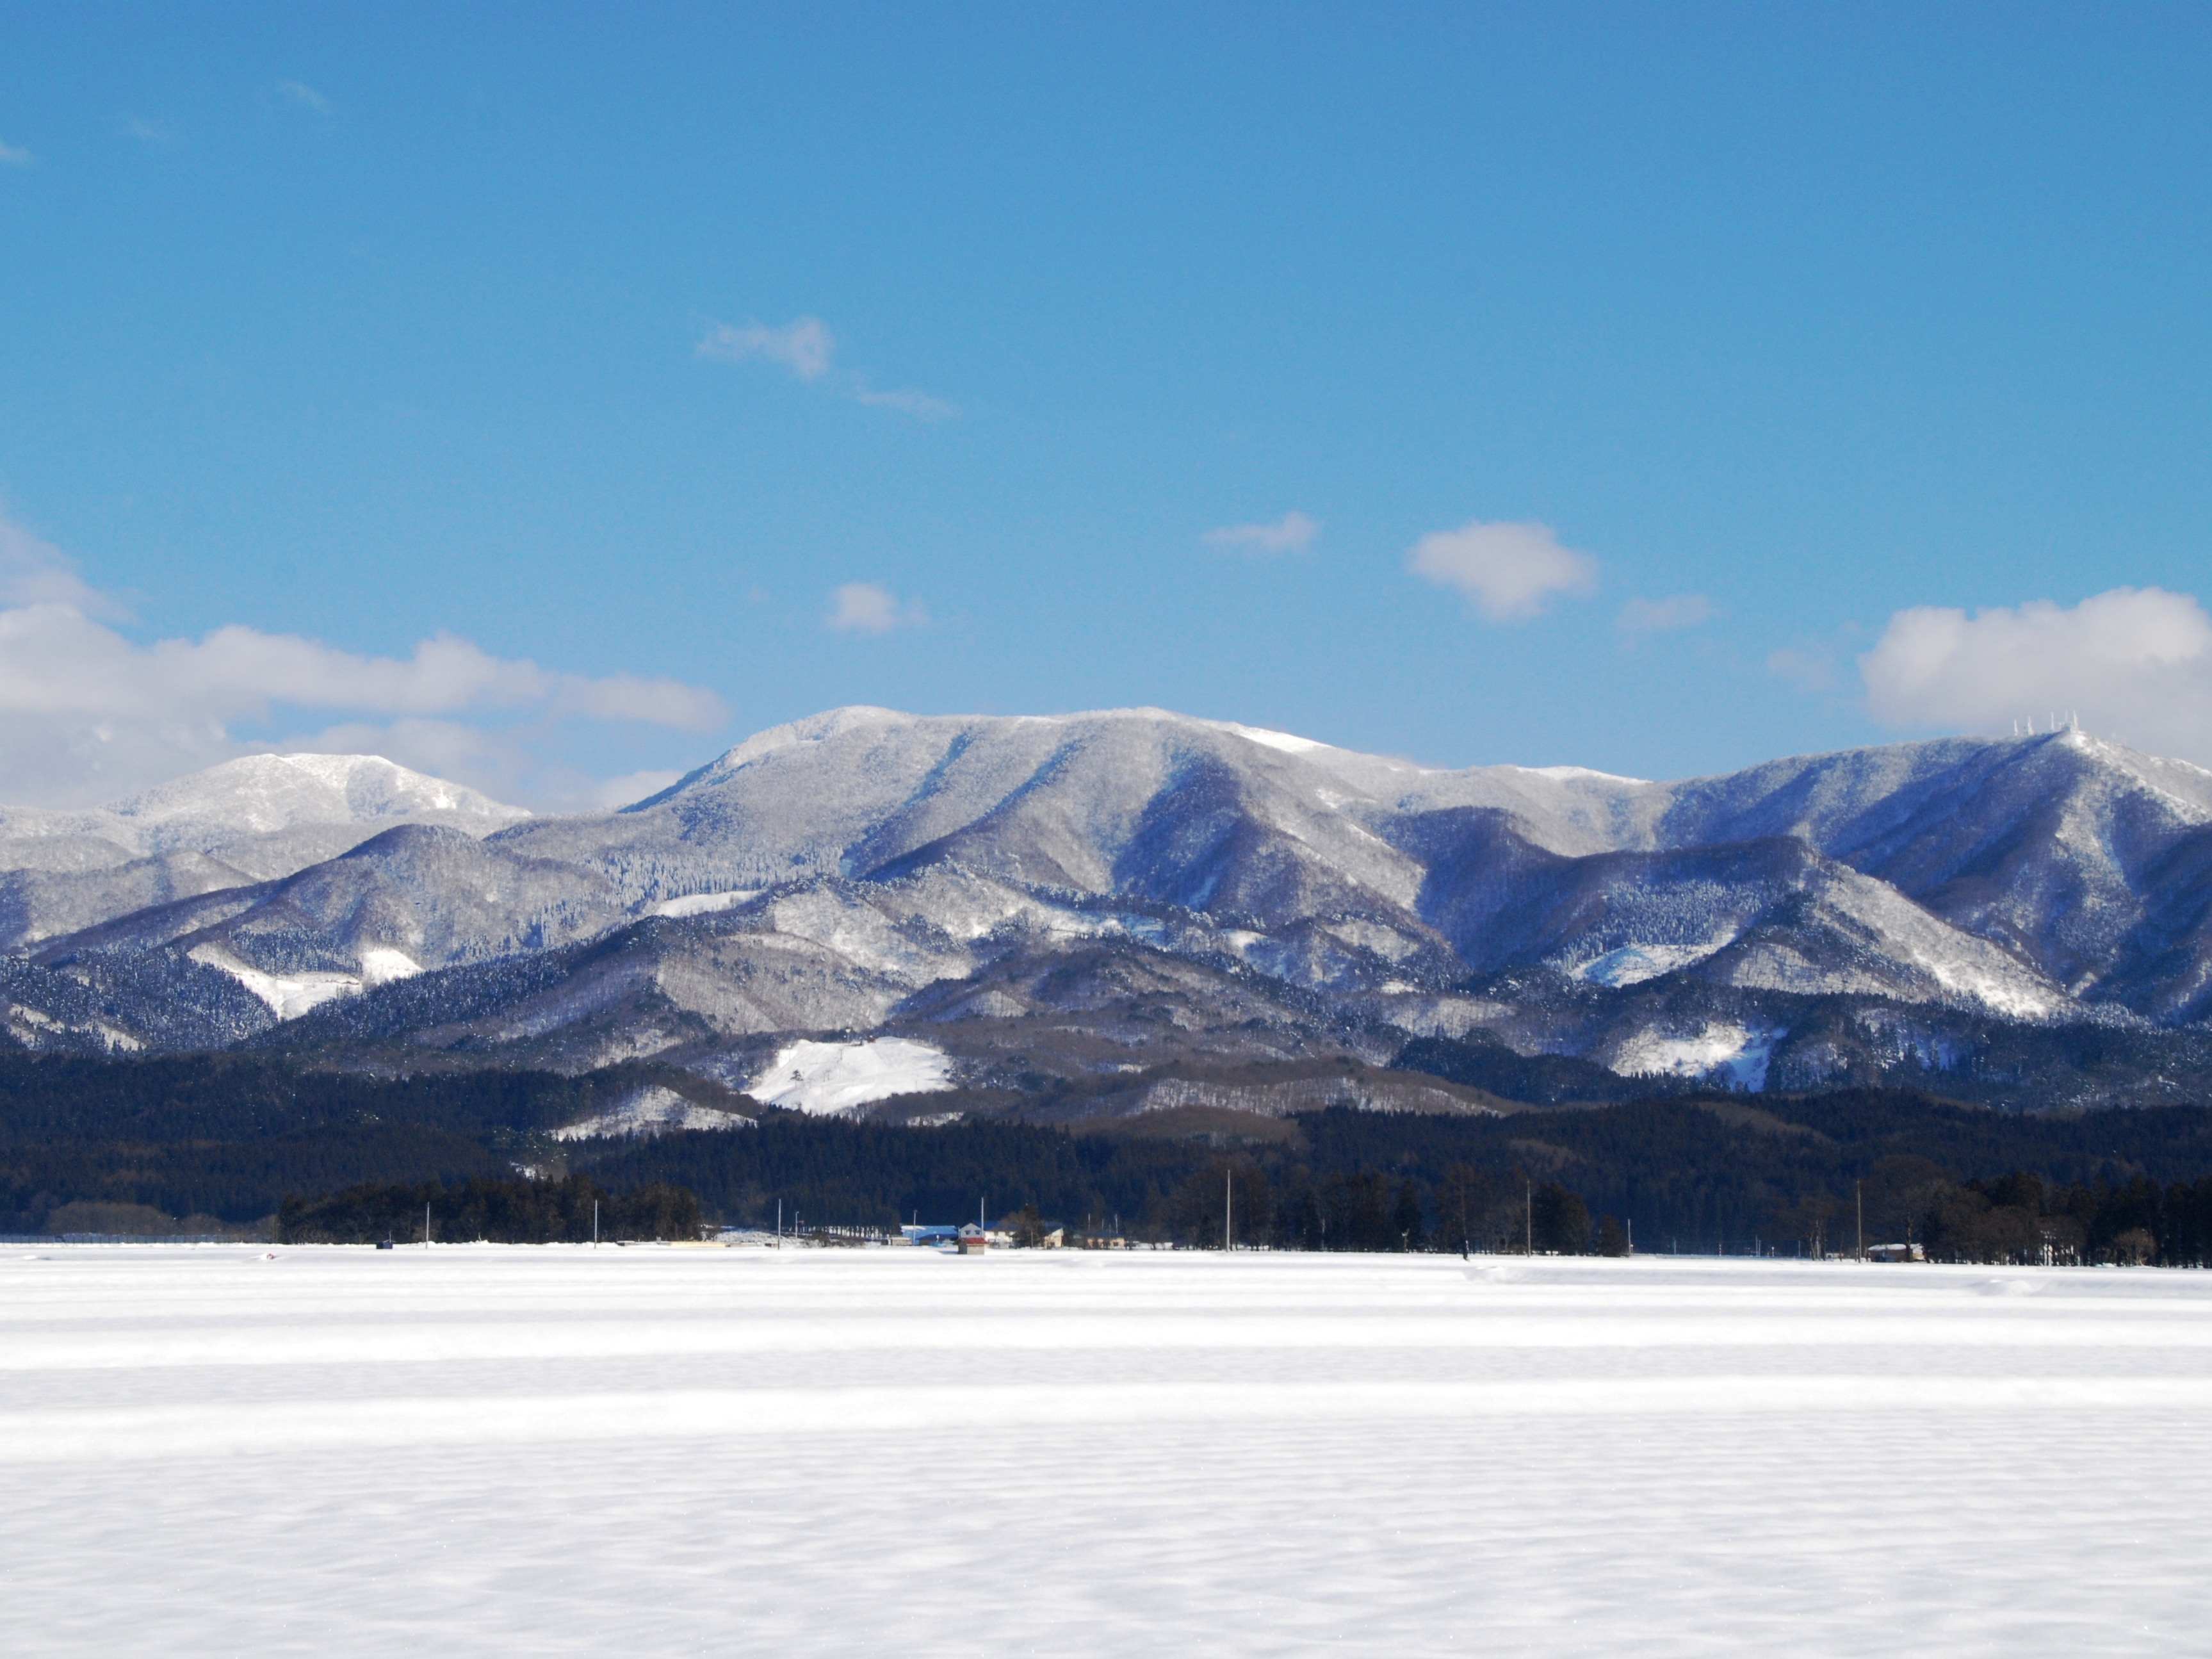 郊外の雪景色